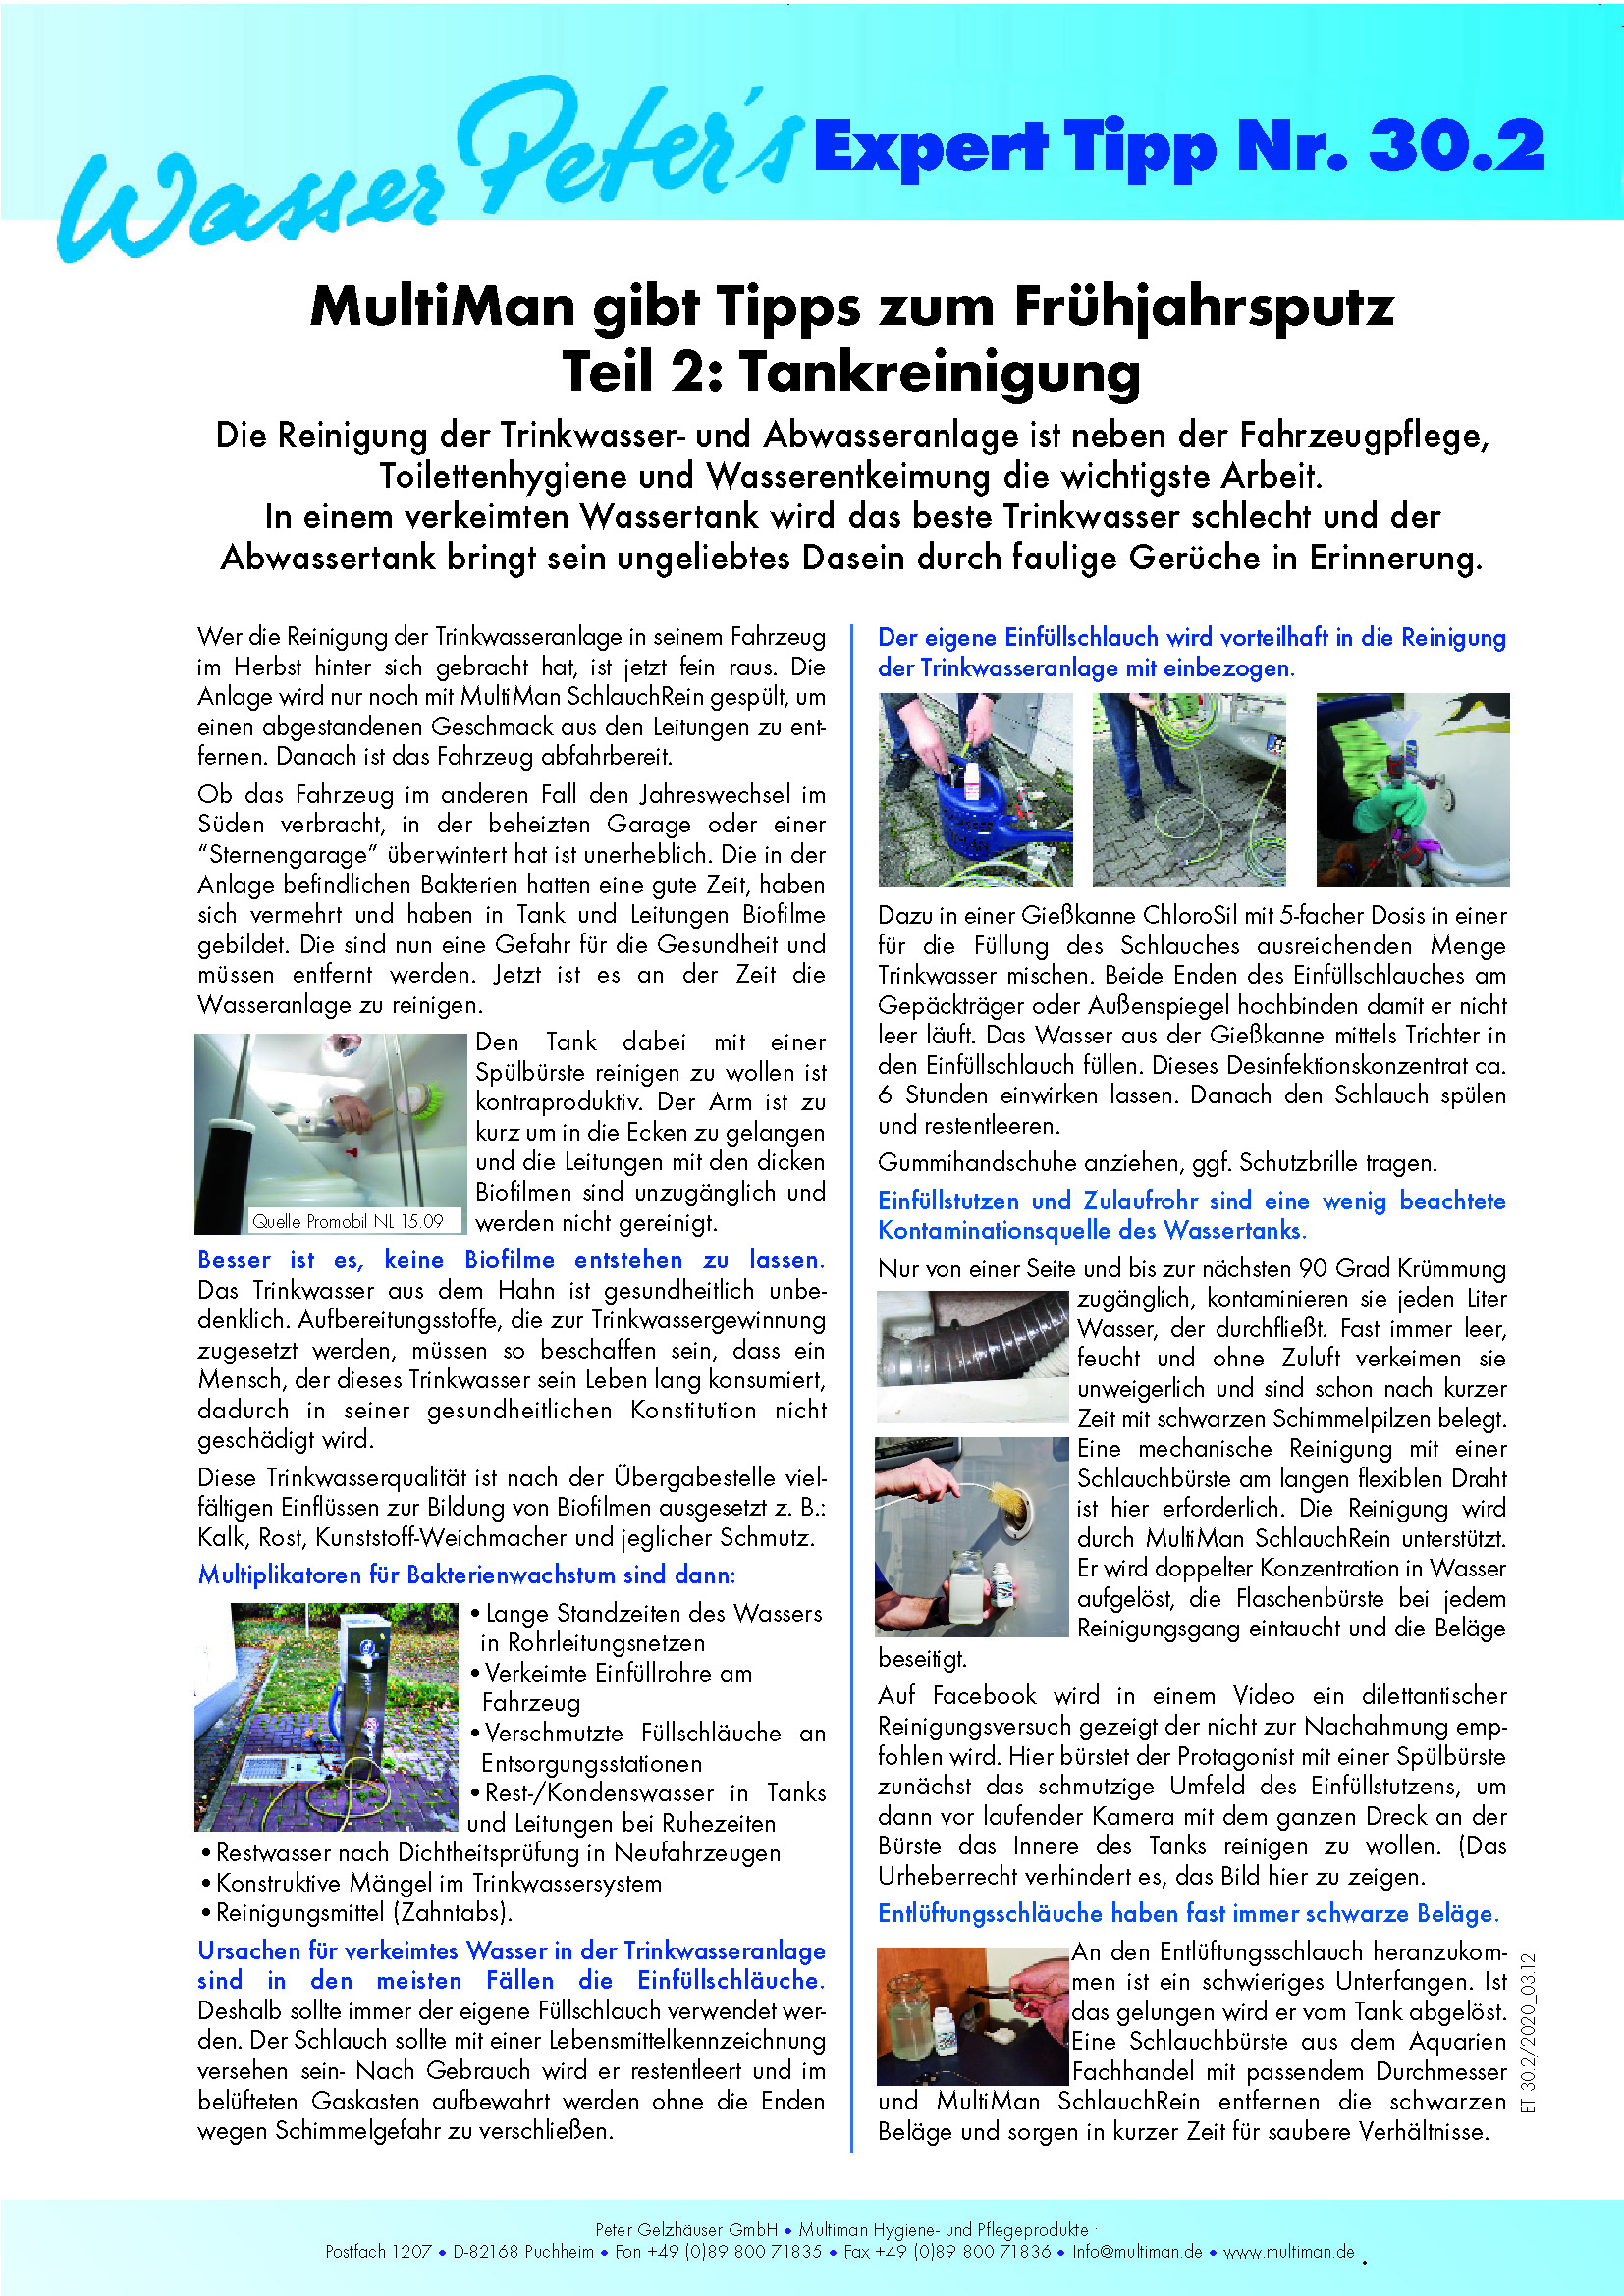 ET-Nr-30-2_-20-3-12-Fr-hjahrsputz-Teil-2-Tankreinigung_HQ_Seite_10SVkg1DDoRhbm